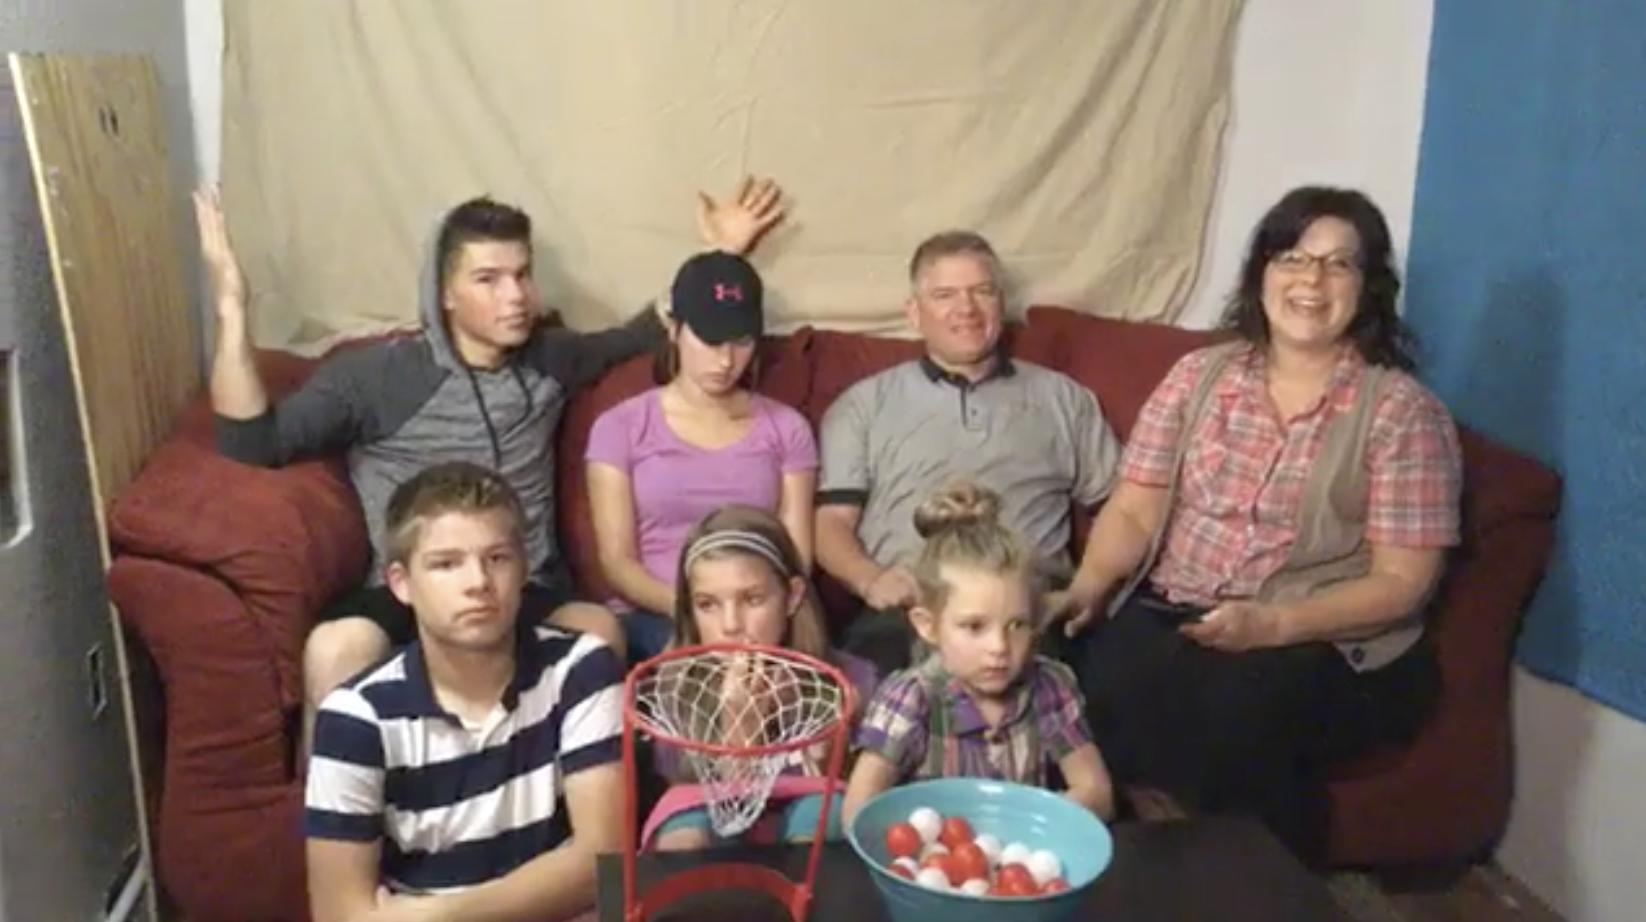 Bates Family Live Carlin And Evan